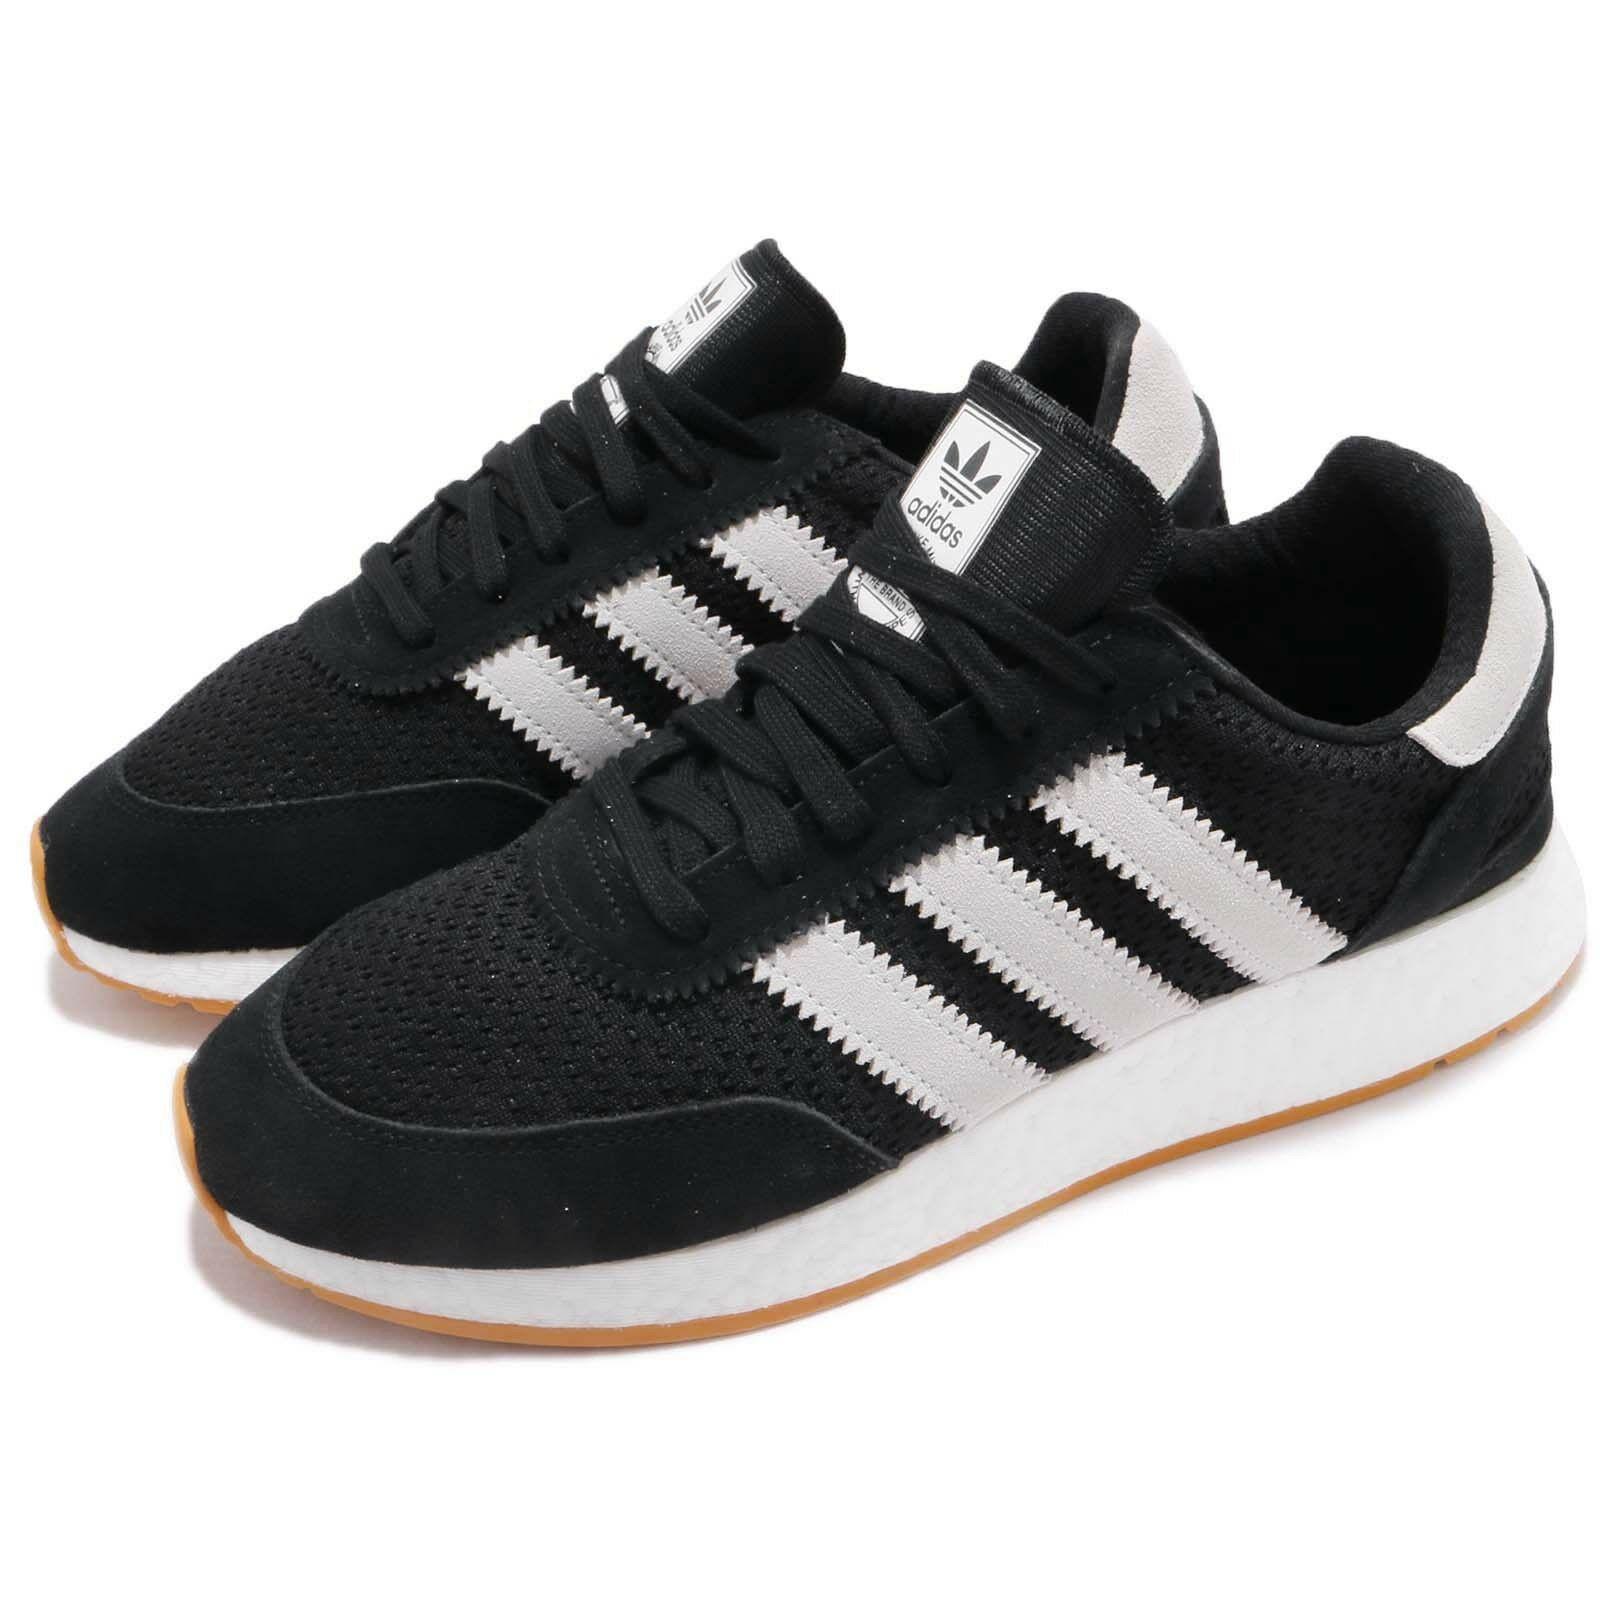 Adidas I 5923 Black White Gum